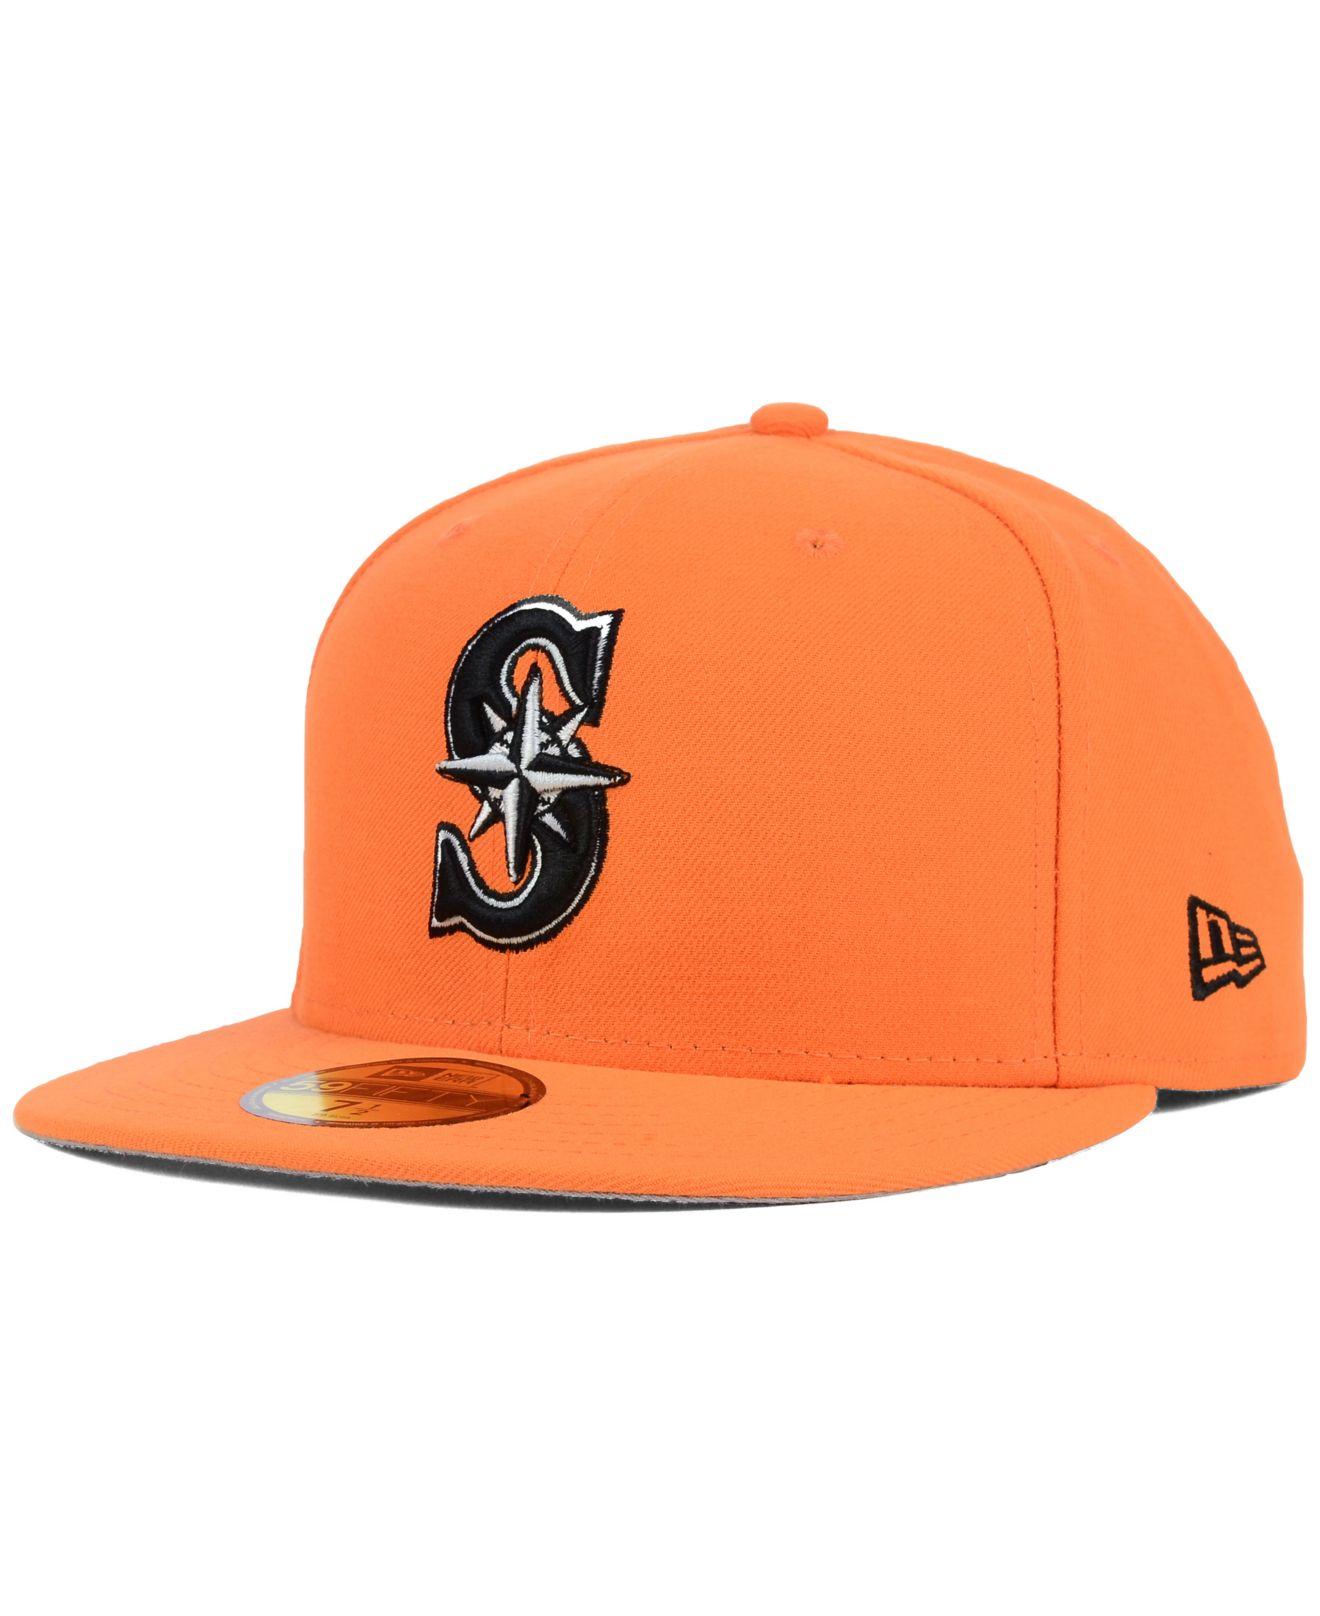 super popular 46414 27dd0 ... sweden lyst ktz seattle mariners c dub 59fifty cap in orange for men  63c51 dbef8